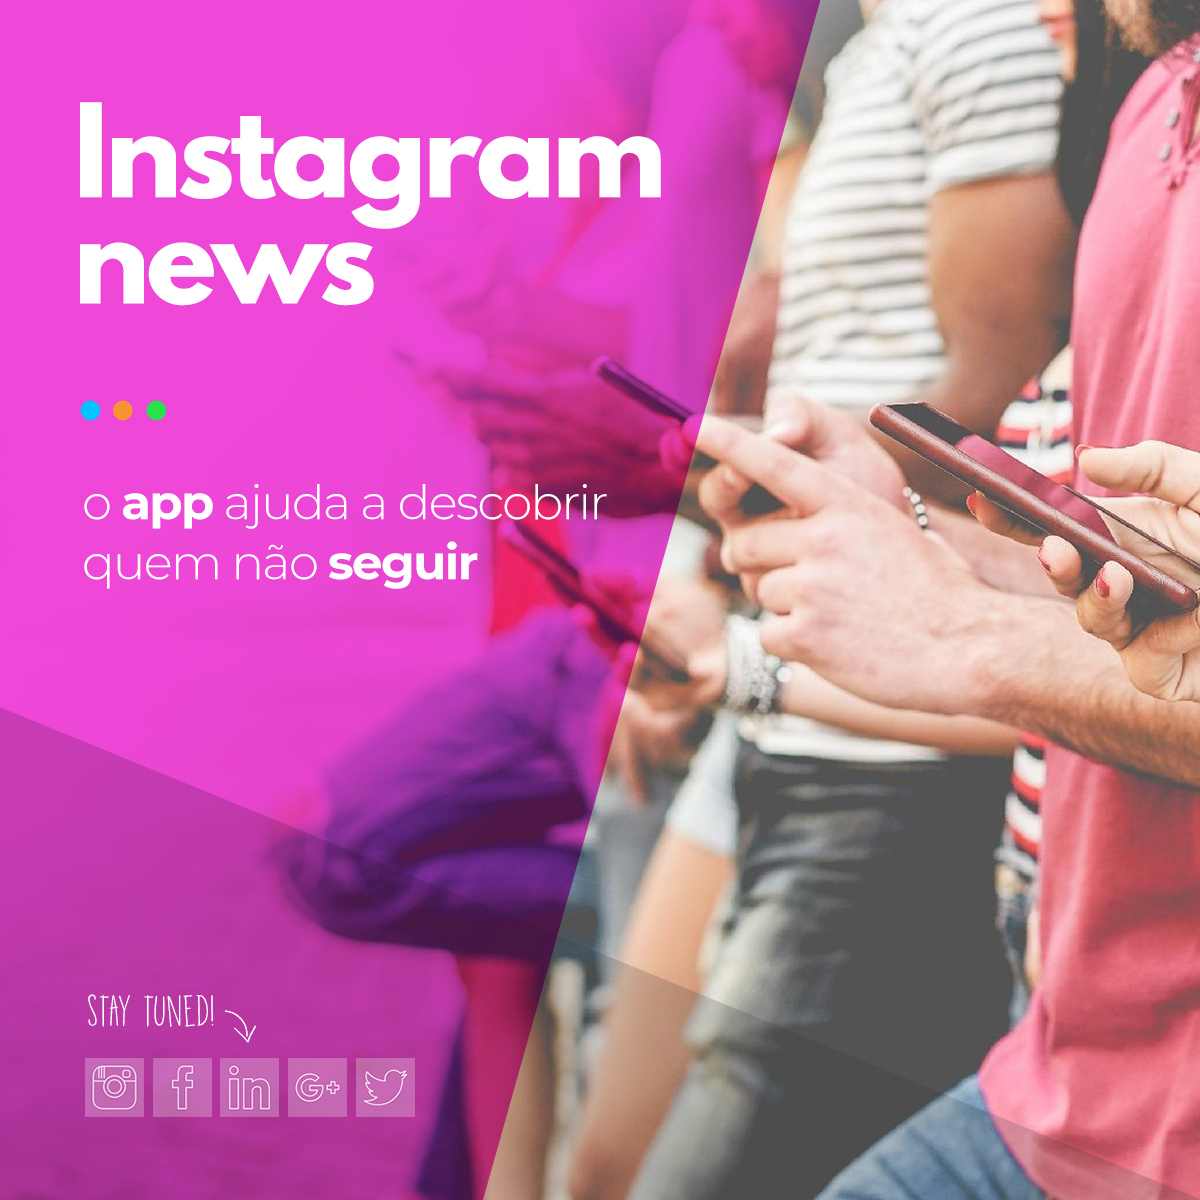 Instagramnews